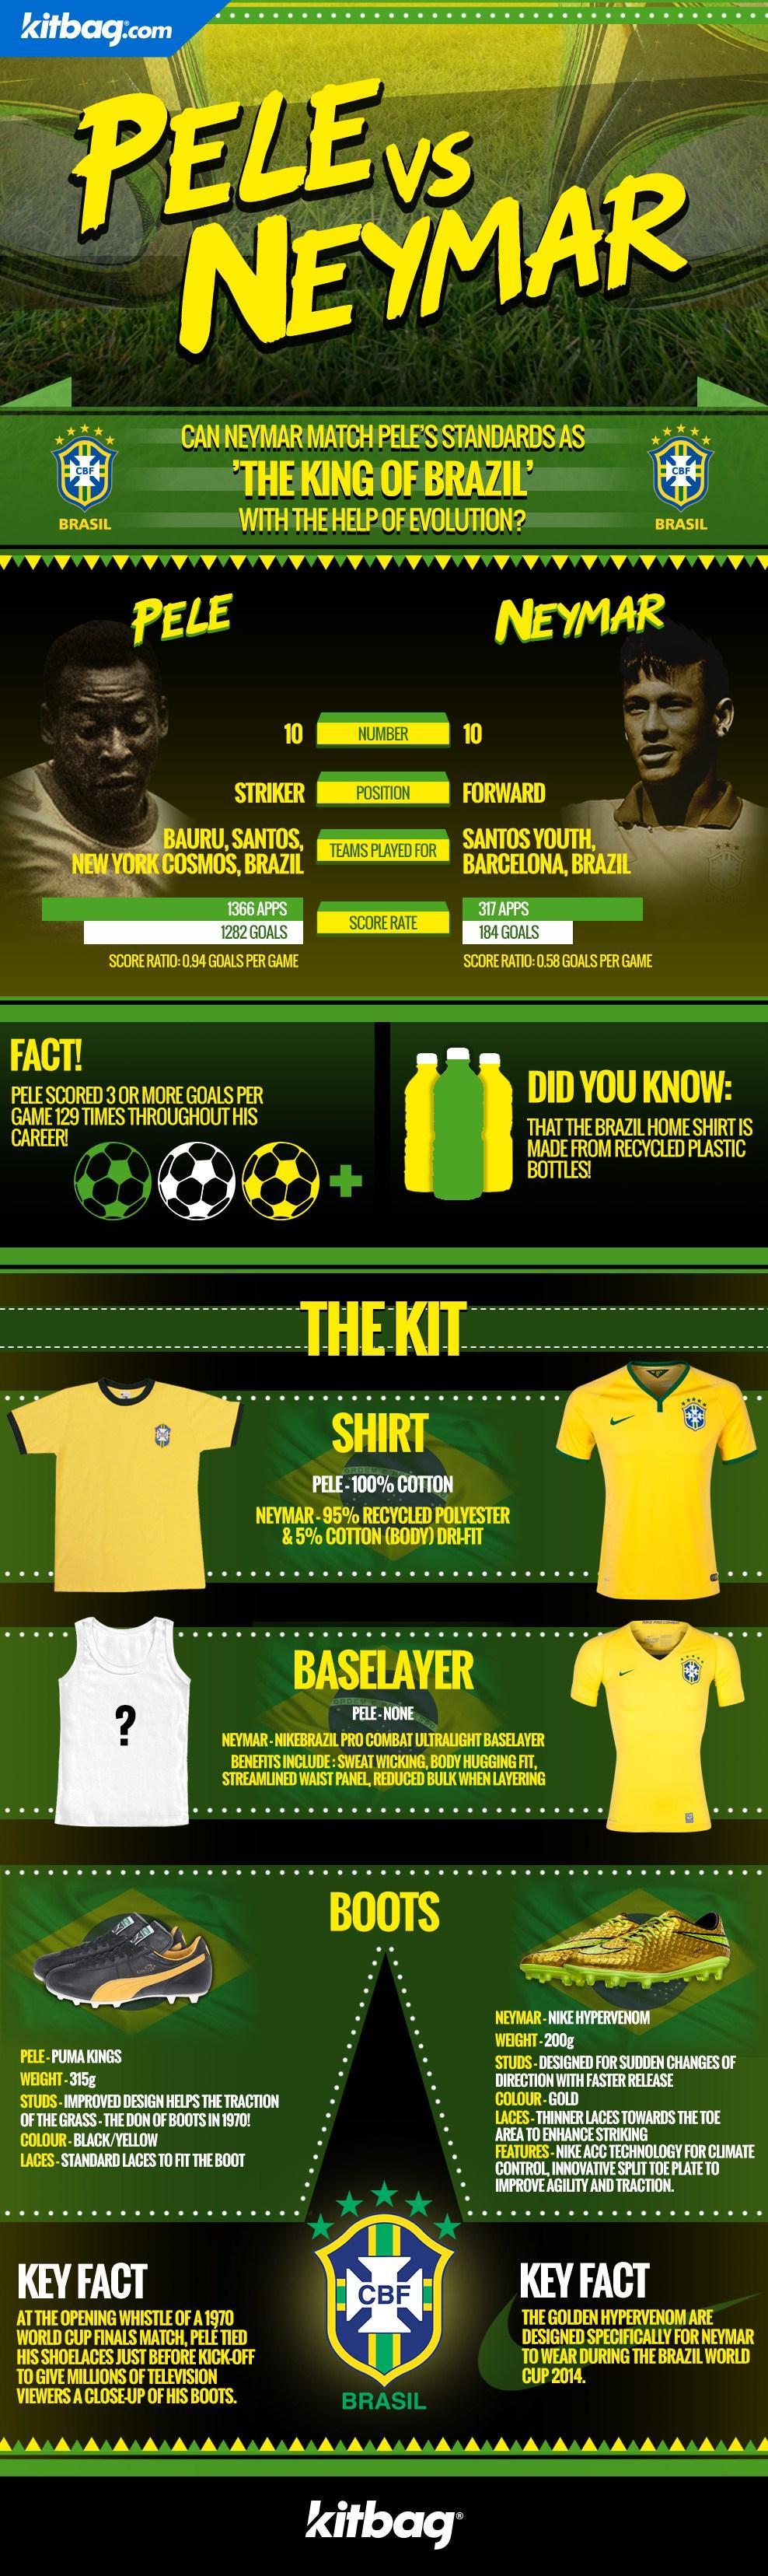 Oasdom.com - King of brazil - Pele vs Neymar